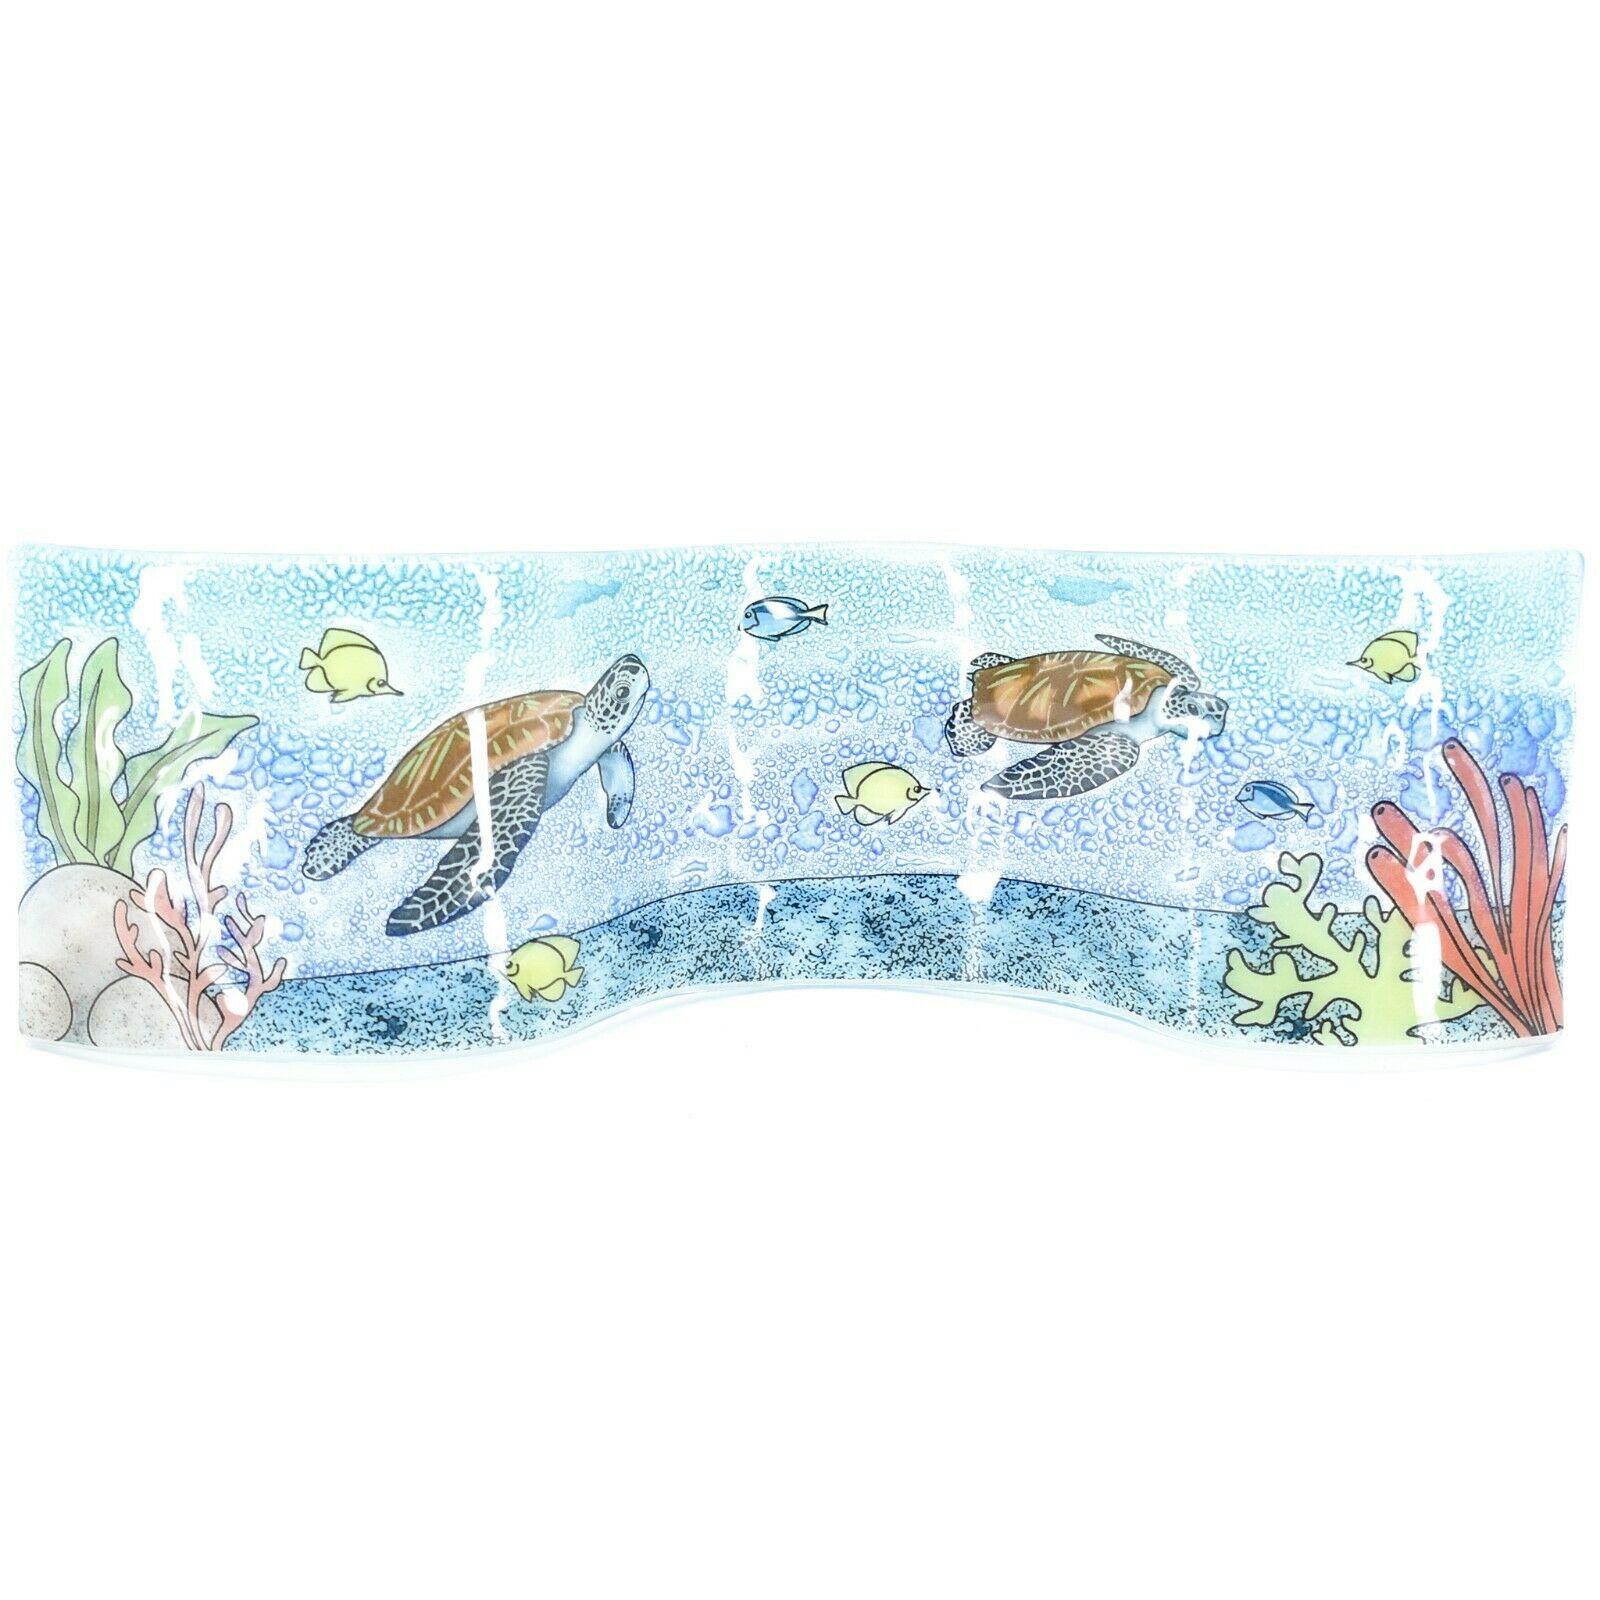 Fused Art Glass Sea Turtles & Fish Underwater Wavy Sun Catcher Handmade Ecuador